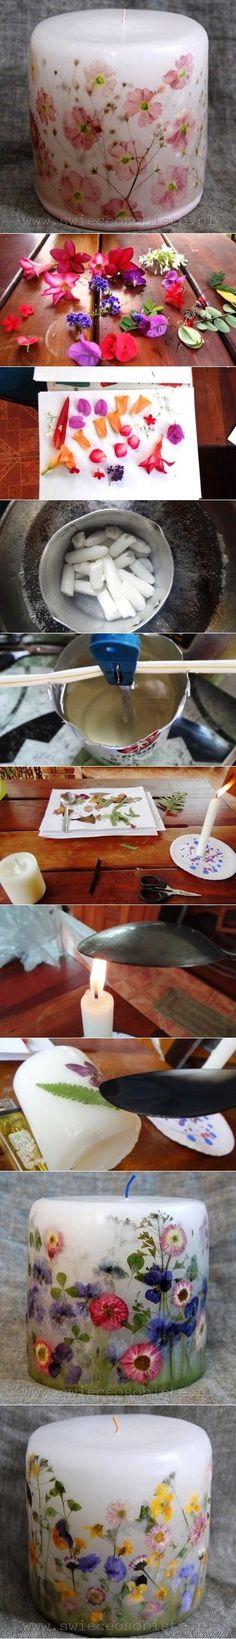 DIY flower candles- beautiful!